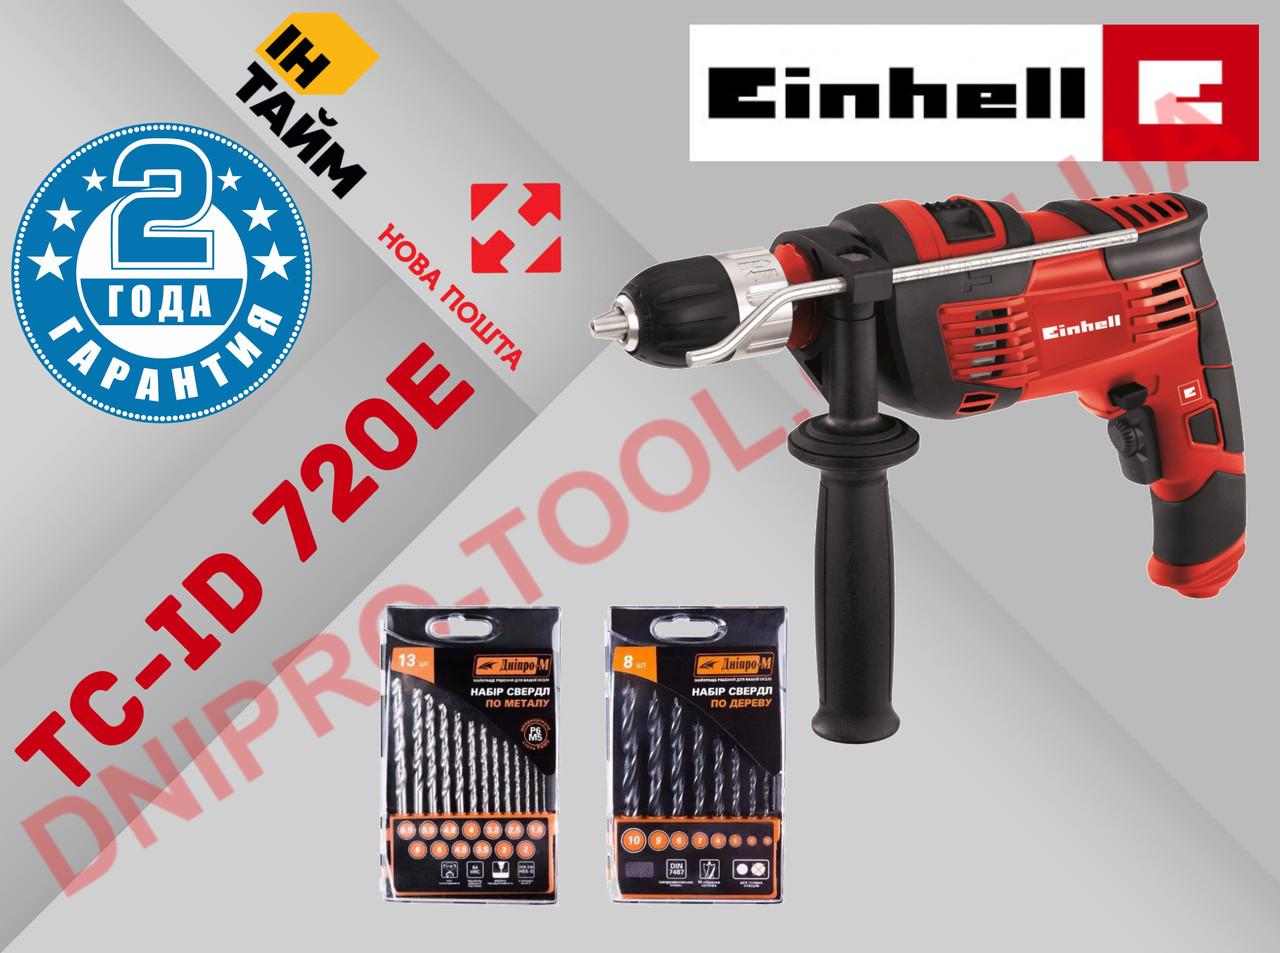 Дрель ударная электрическая Einhell TC-ID 720/1 E